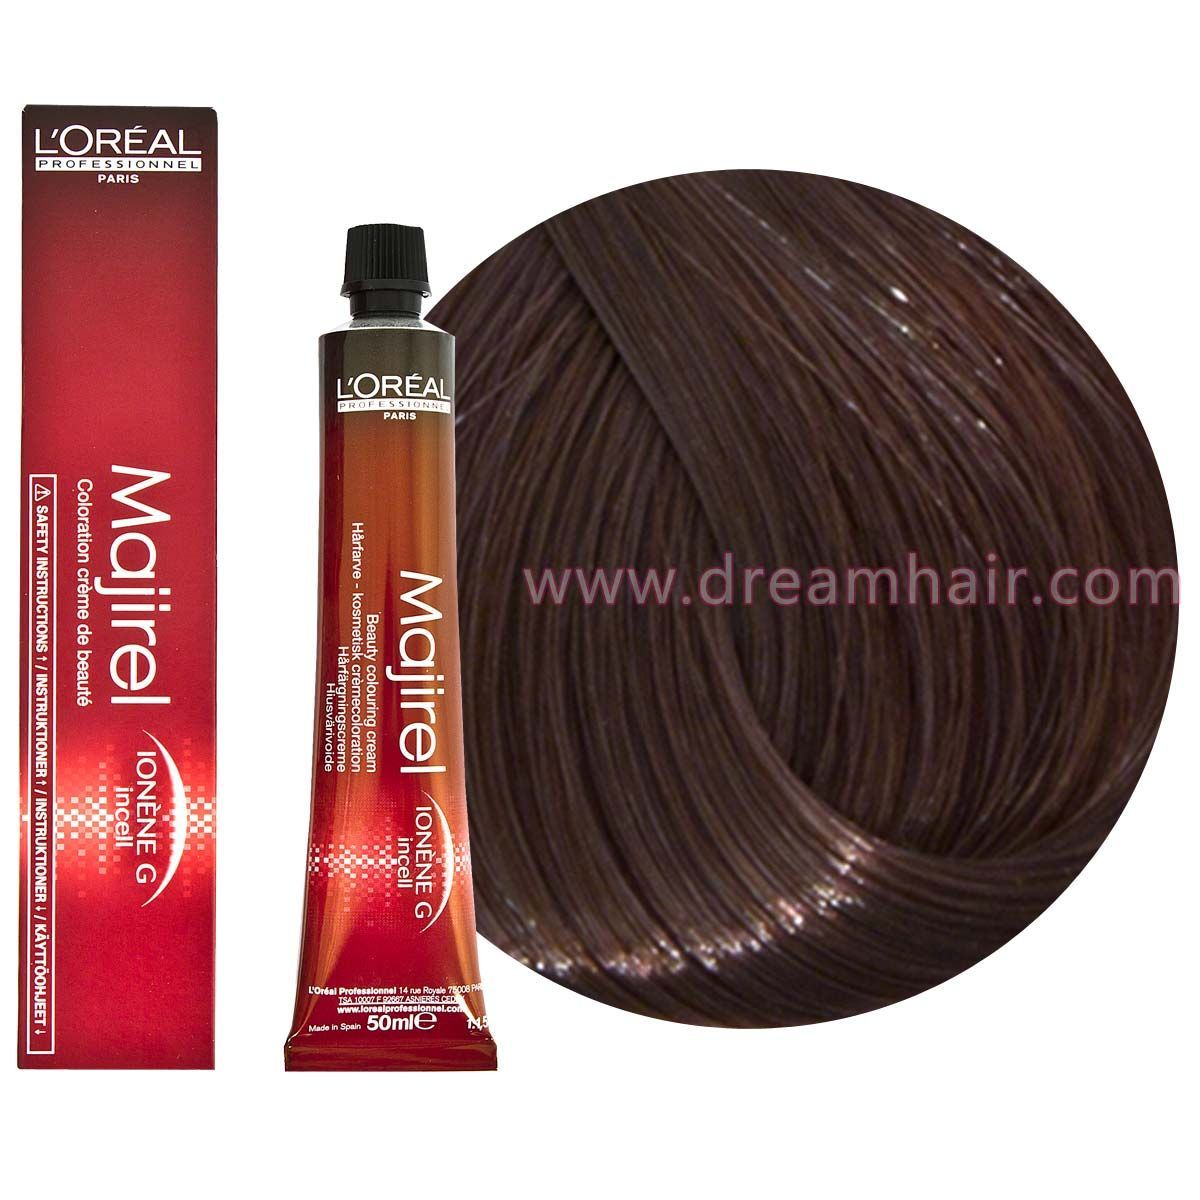 Loreal Majirel 58 Loreal Majirel Permanent Hair Color Hair Color